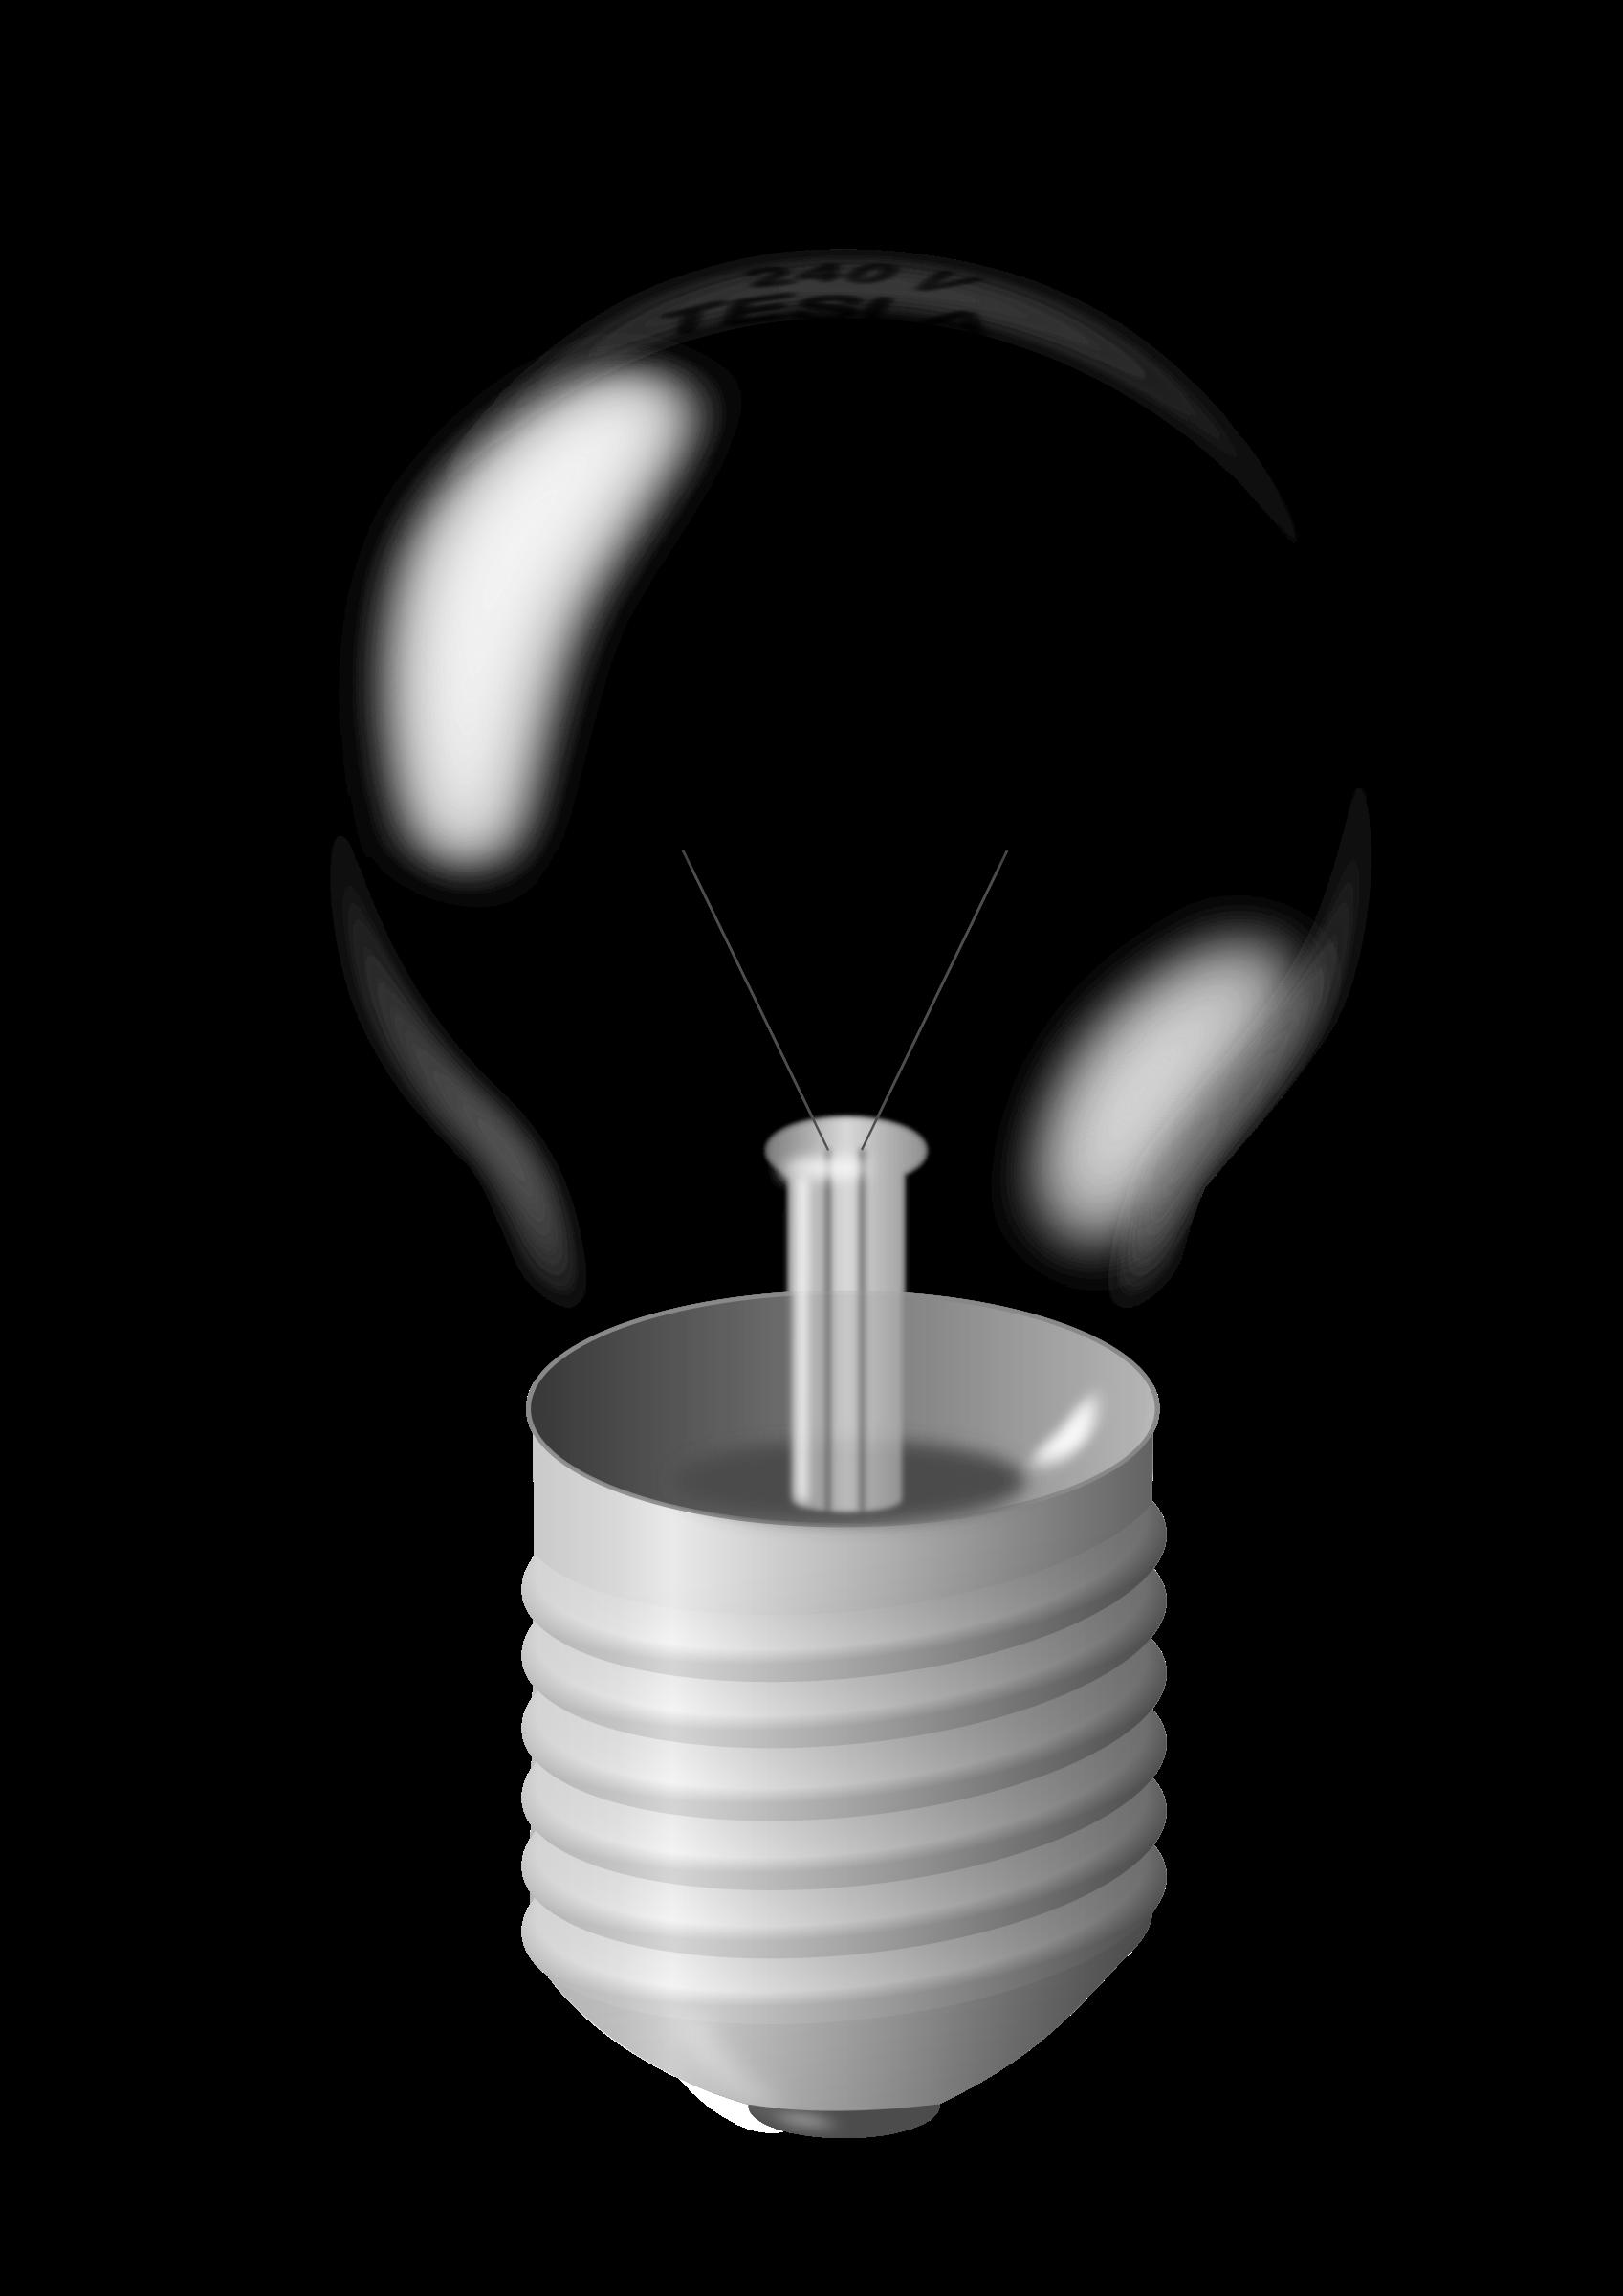 Lights clipart buld. Light bulb